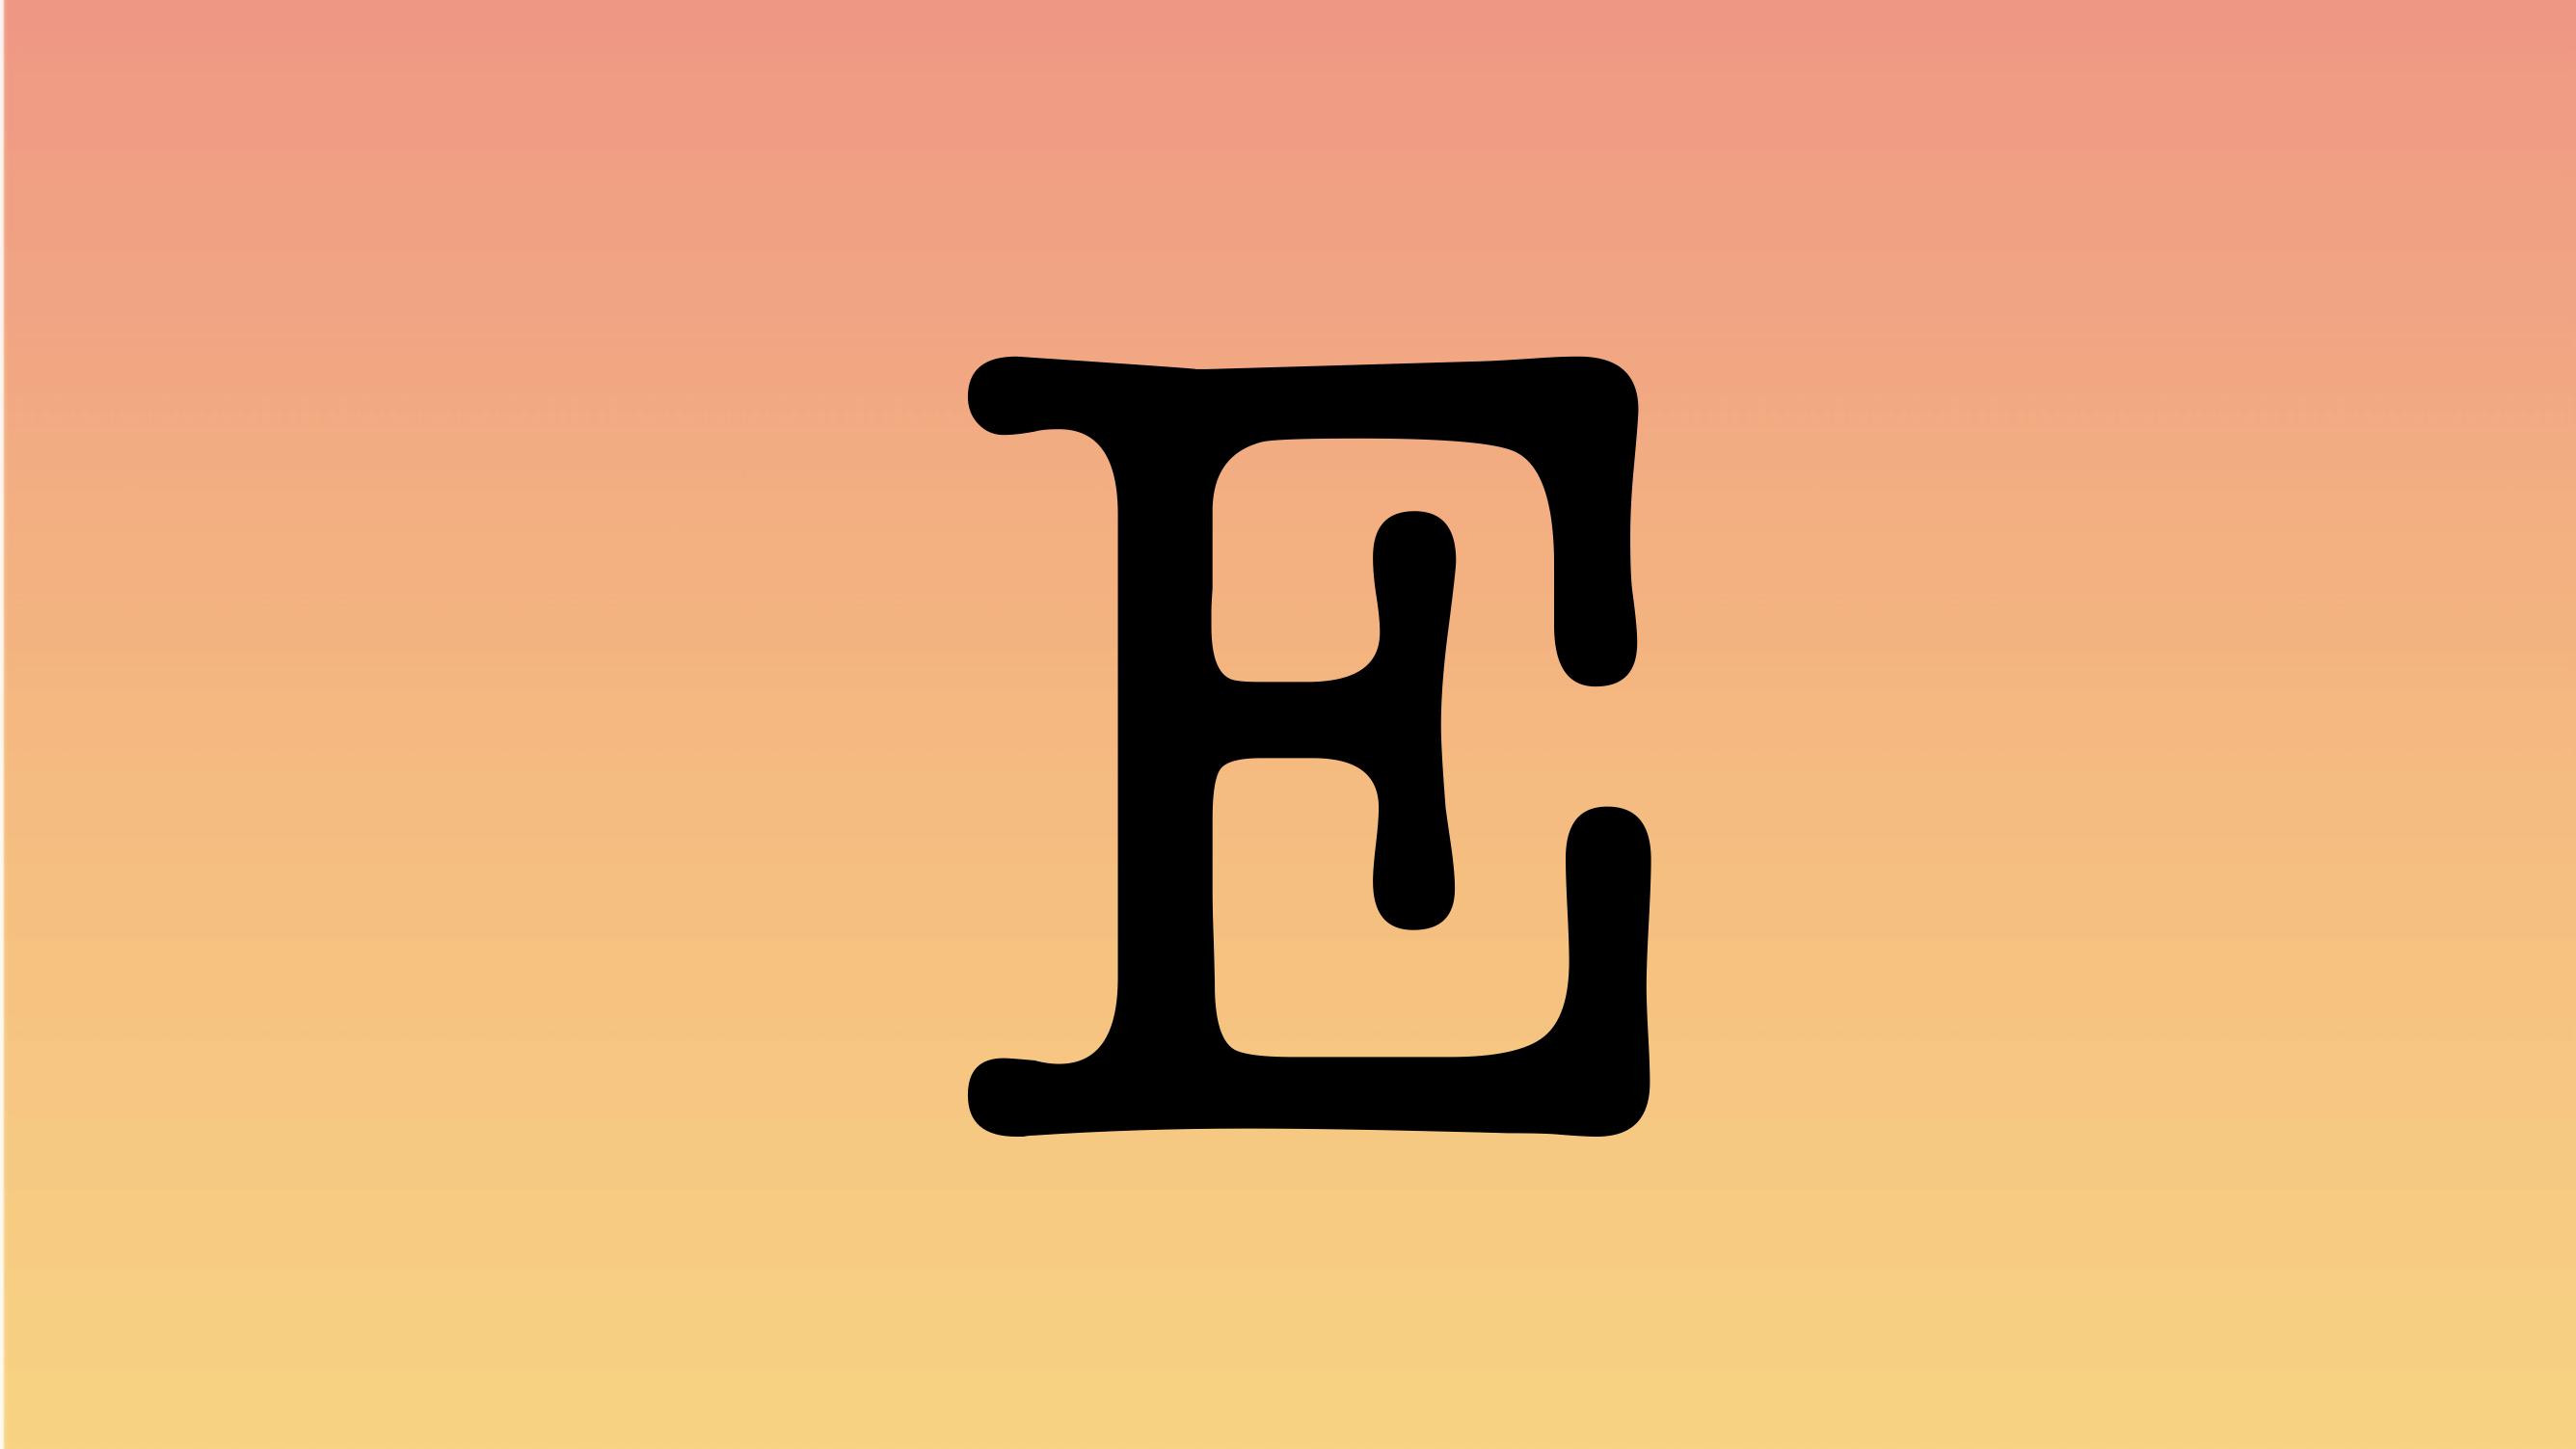 Eから始まる英語のサッカー用語【単語 & フレーズ】